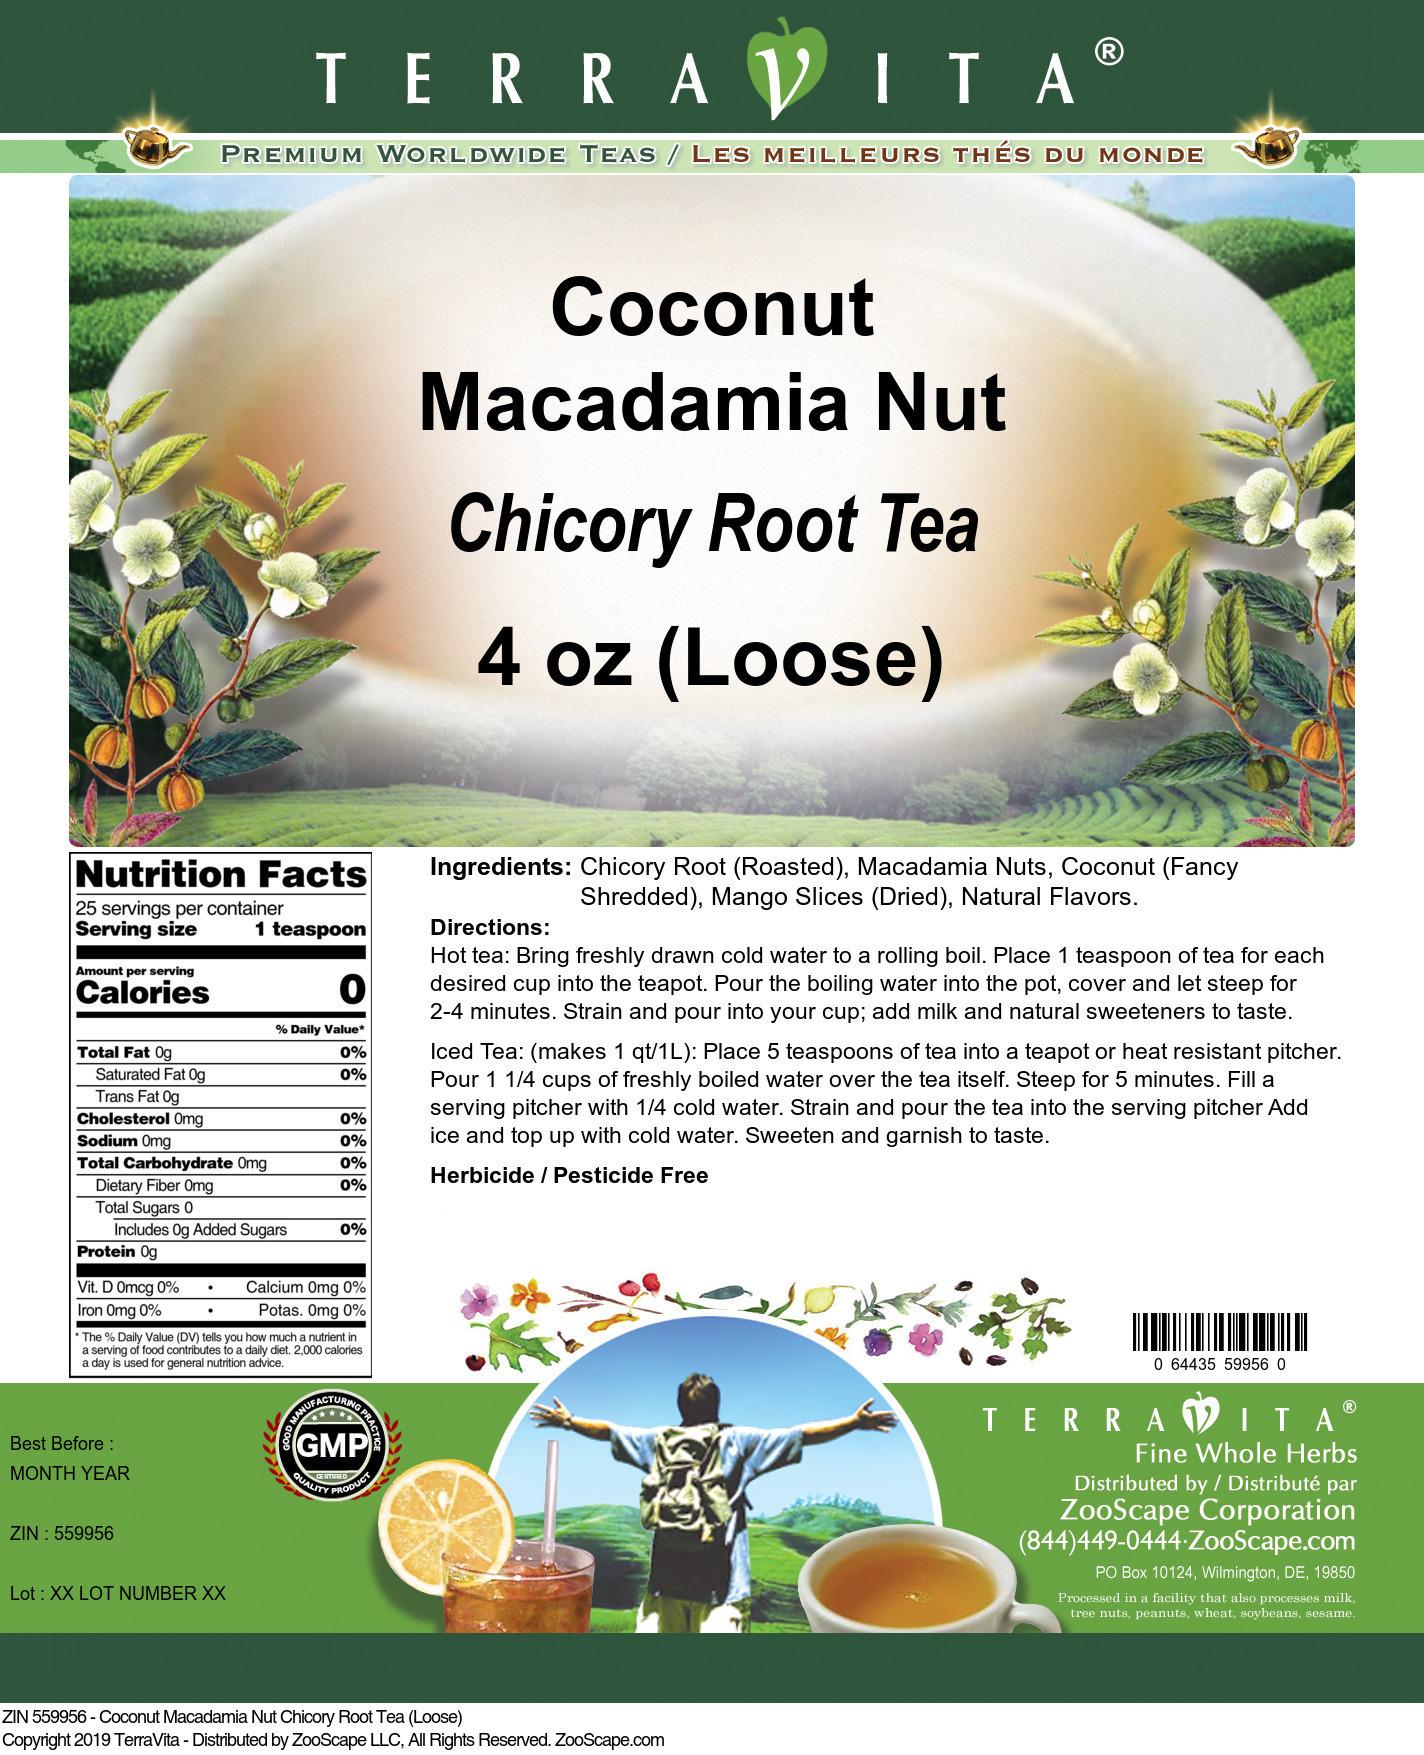 Coconut Macadamia Nut Chicory Root Tea (Loose)